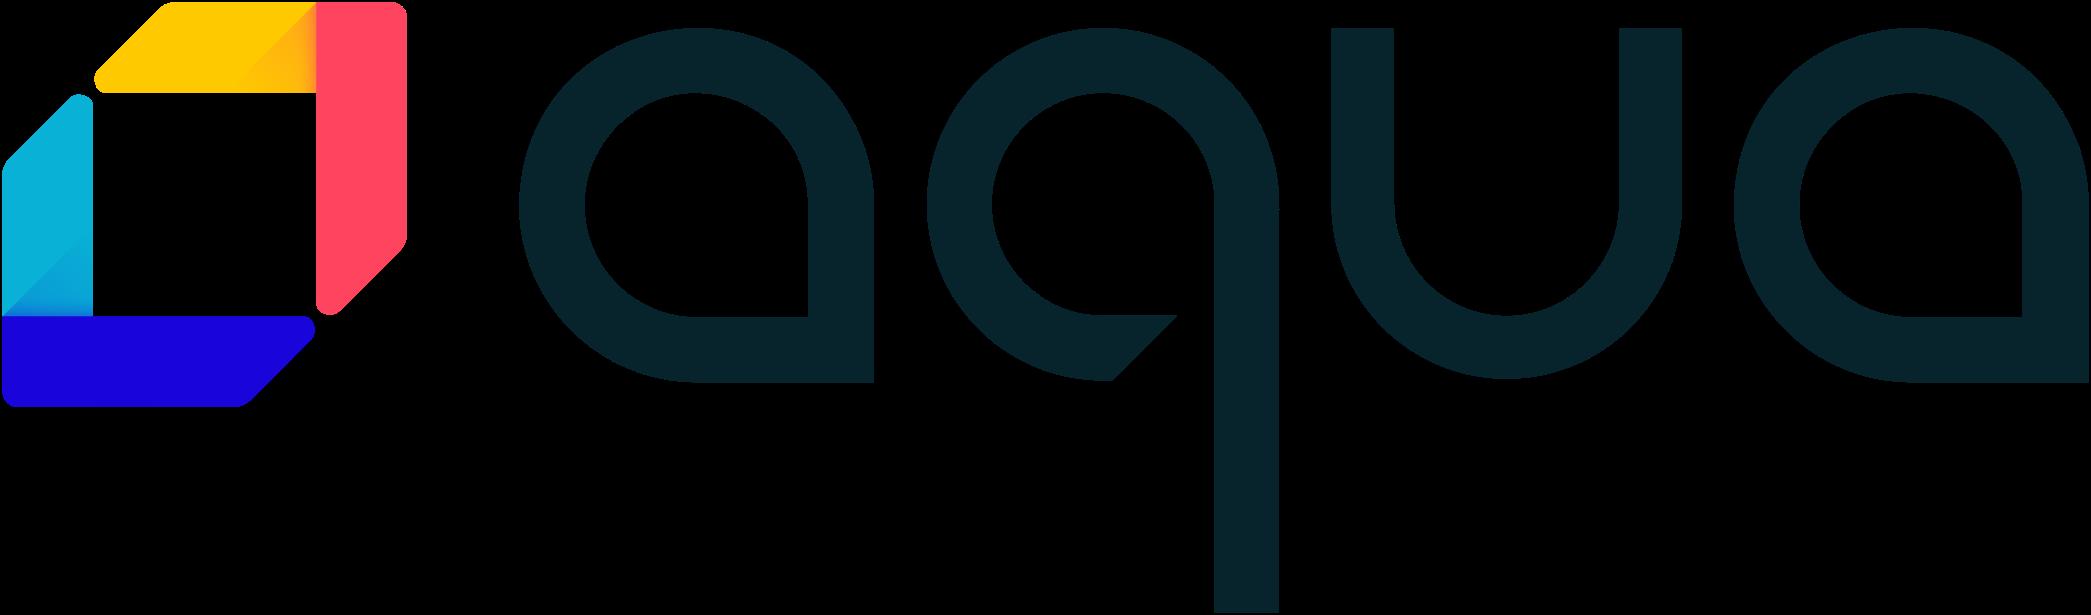 aqua-security-logo